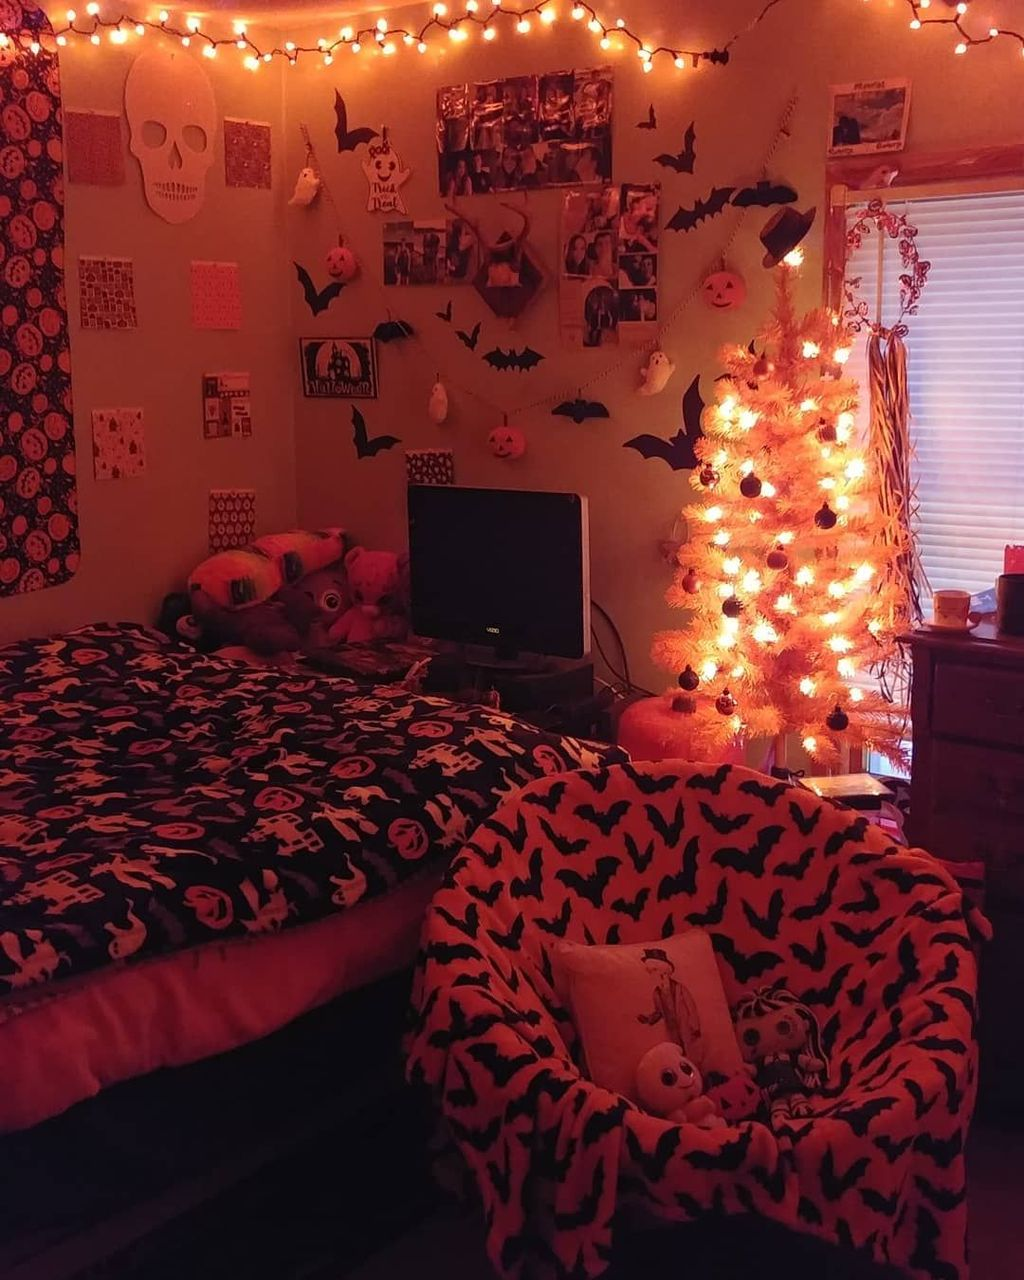 Amazing Bedroom Decoration Ideas With Halloween Theme 30